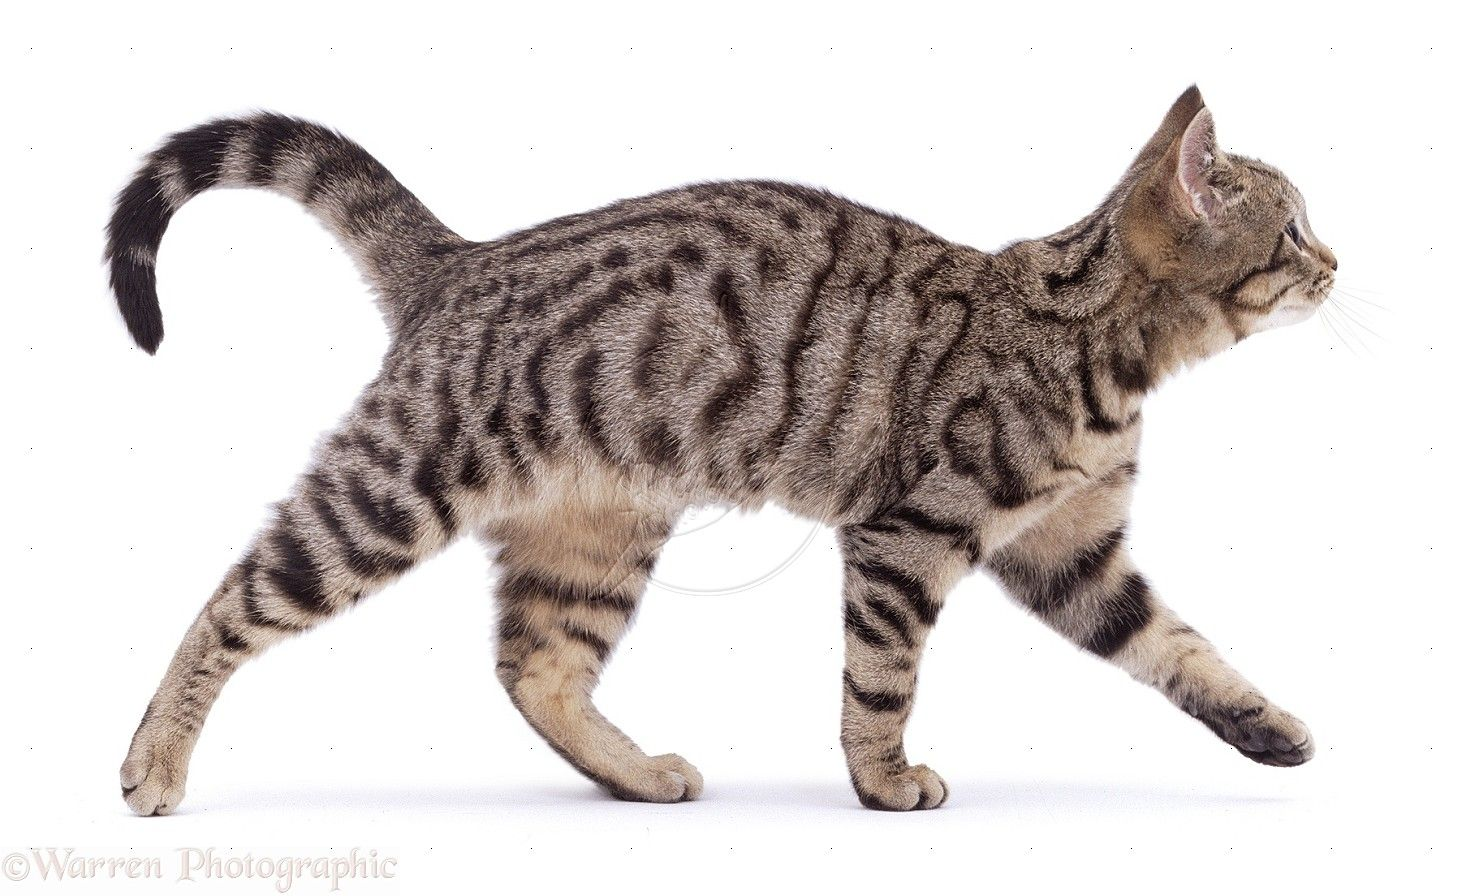 Http Www Warrenphotographic Co Uk 02253 Brown Tabby Cat Walking Tabby Cat Cat Photo Cat Pose